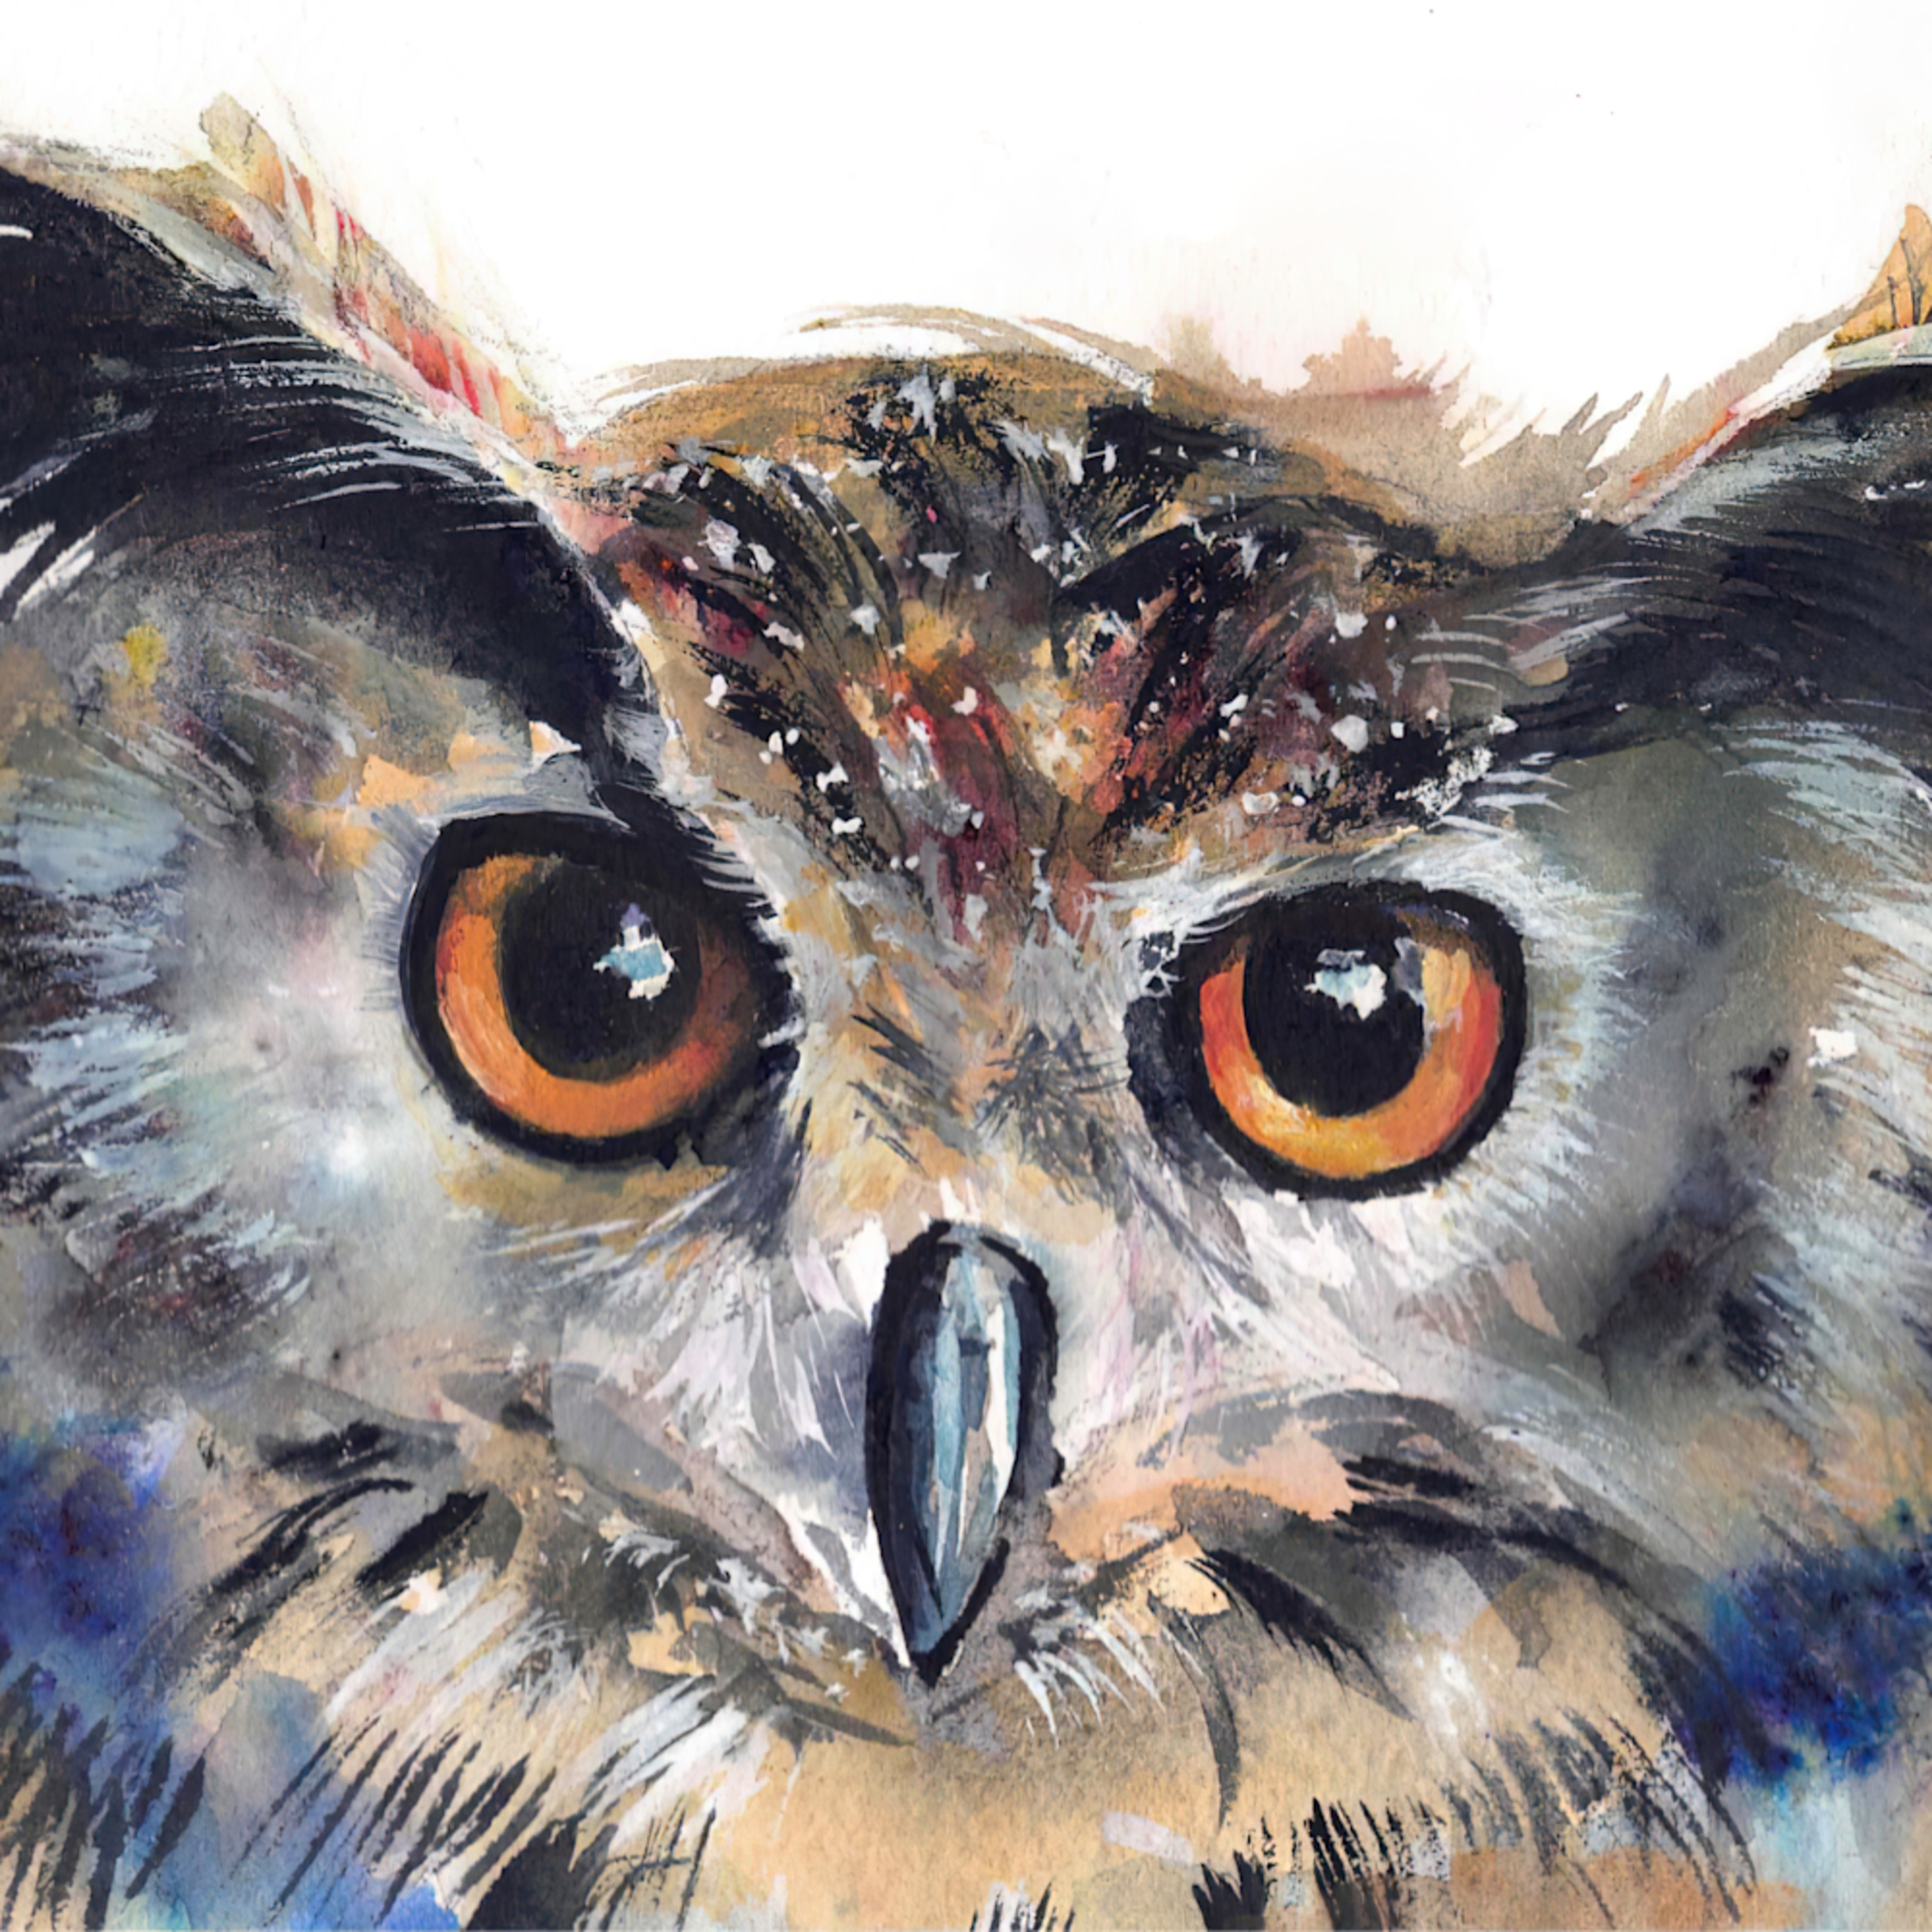 Owlberty q3u8tw